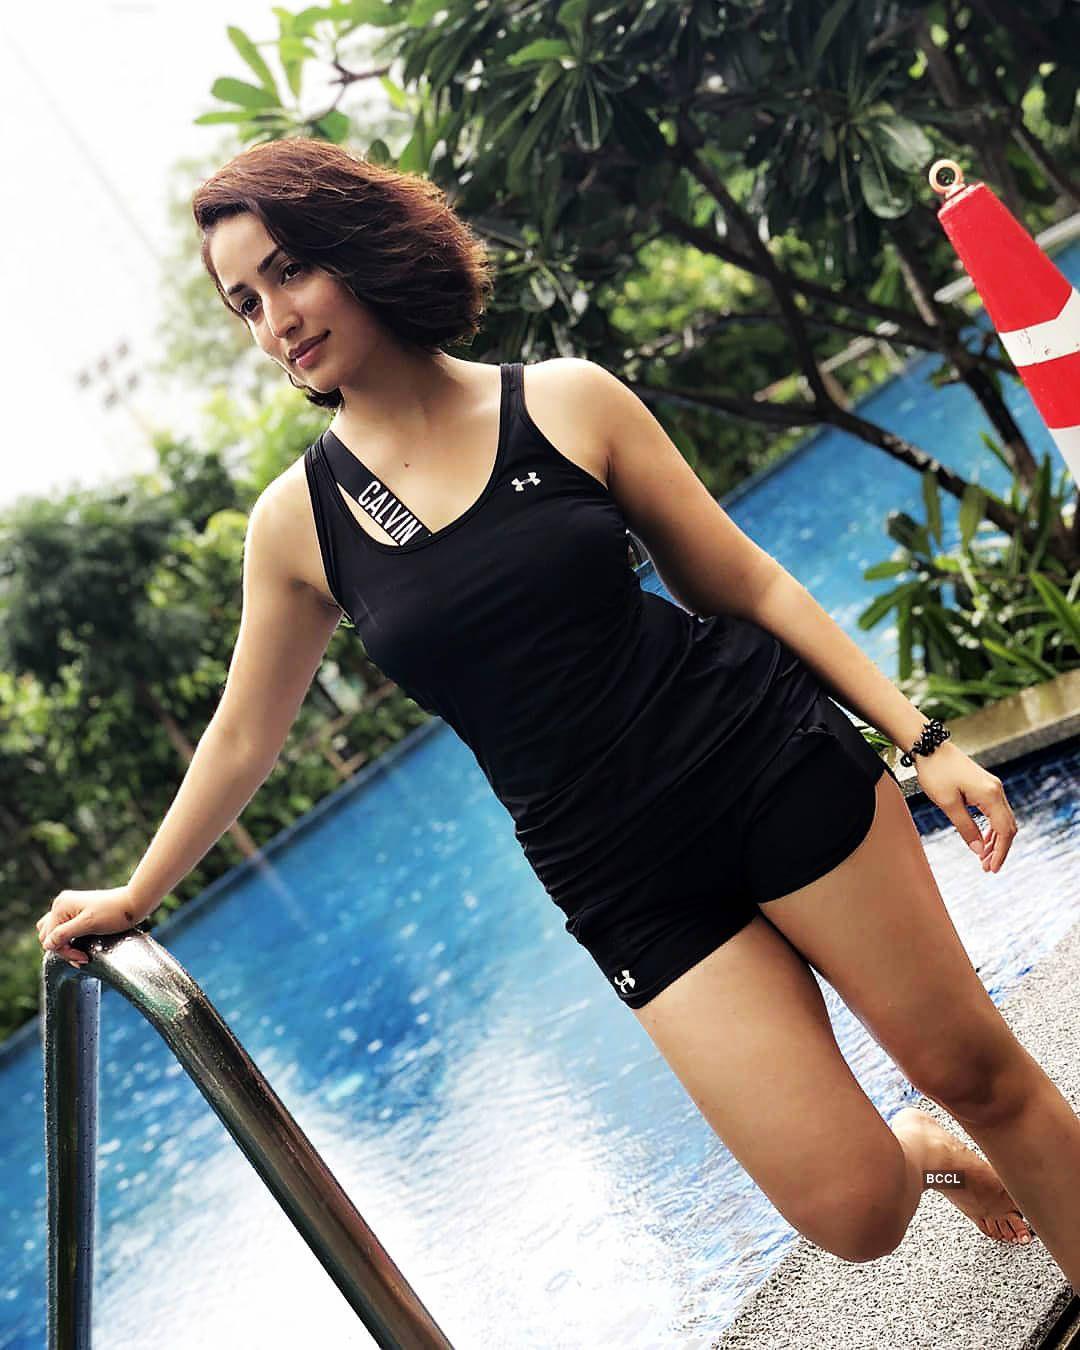 Yami GautamActresses Indian Bikini BollywoodBollywood odWCxerB